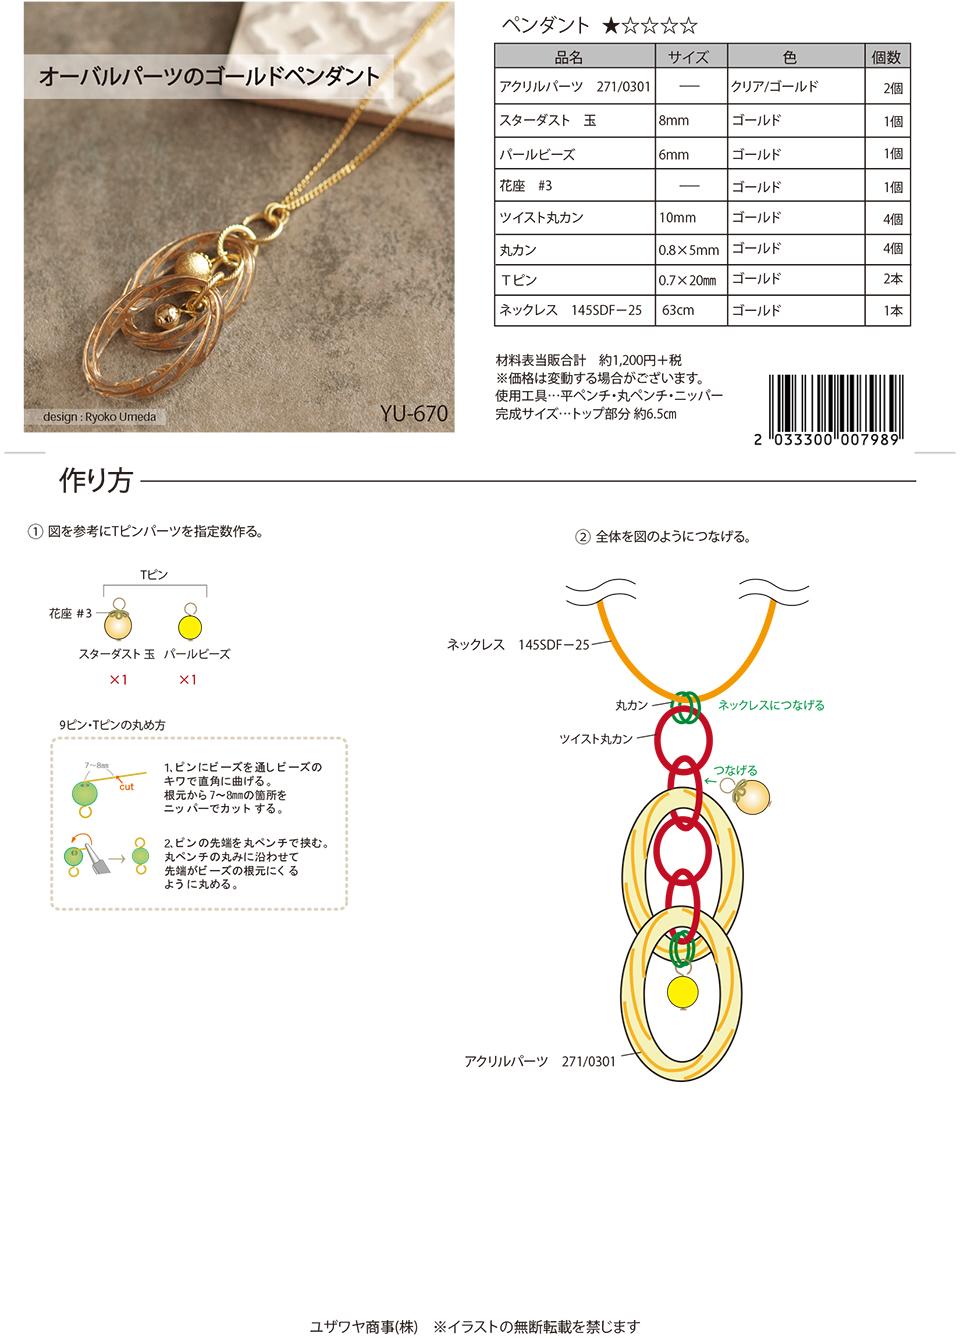 YU-670オーバルパーツのゴールドペンダント_1.jpg